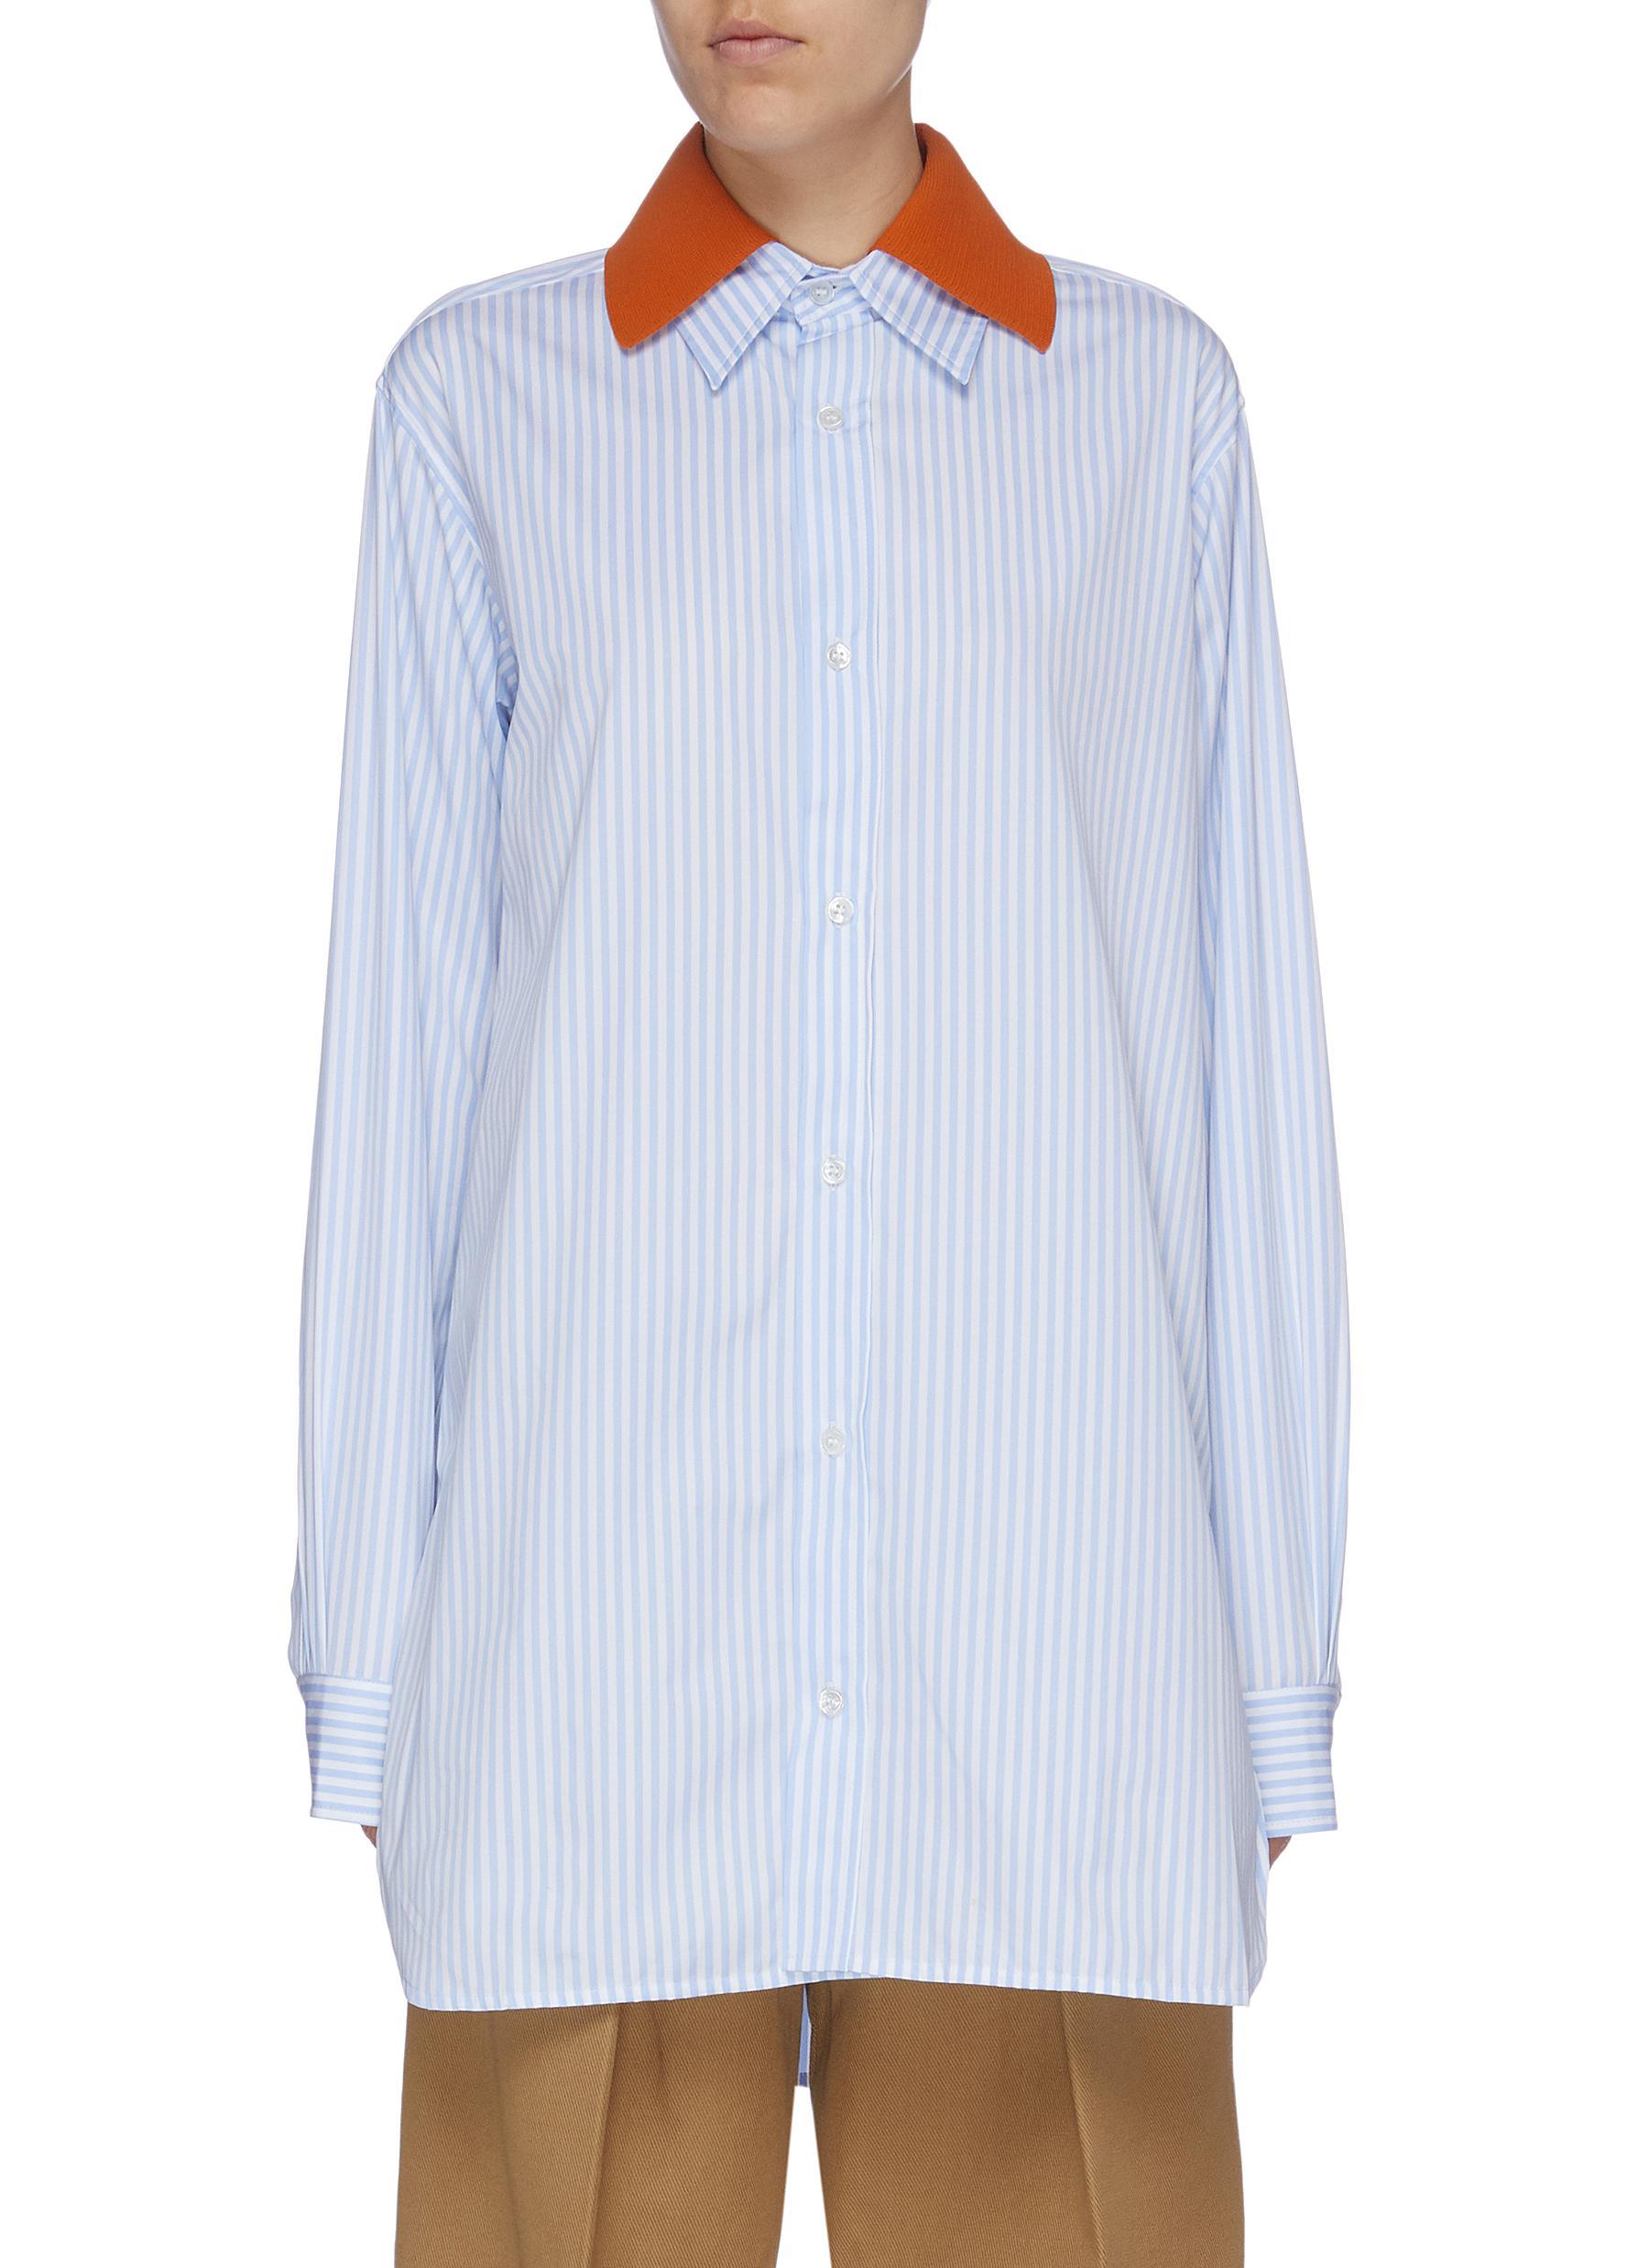 Colourblock layered collar stripe shirt by Plan C